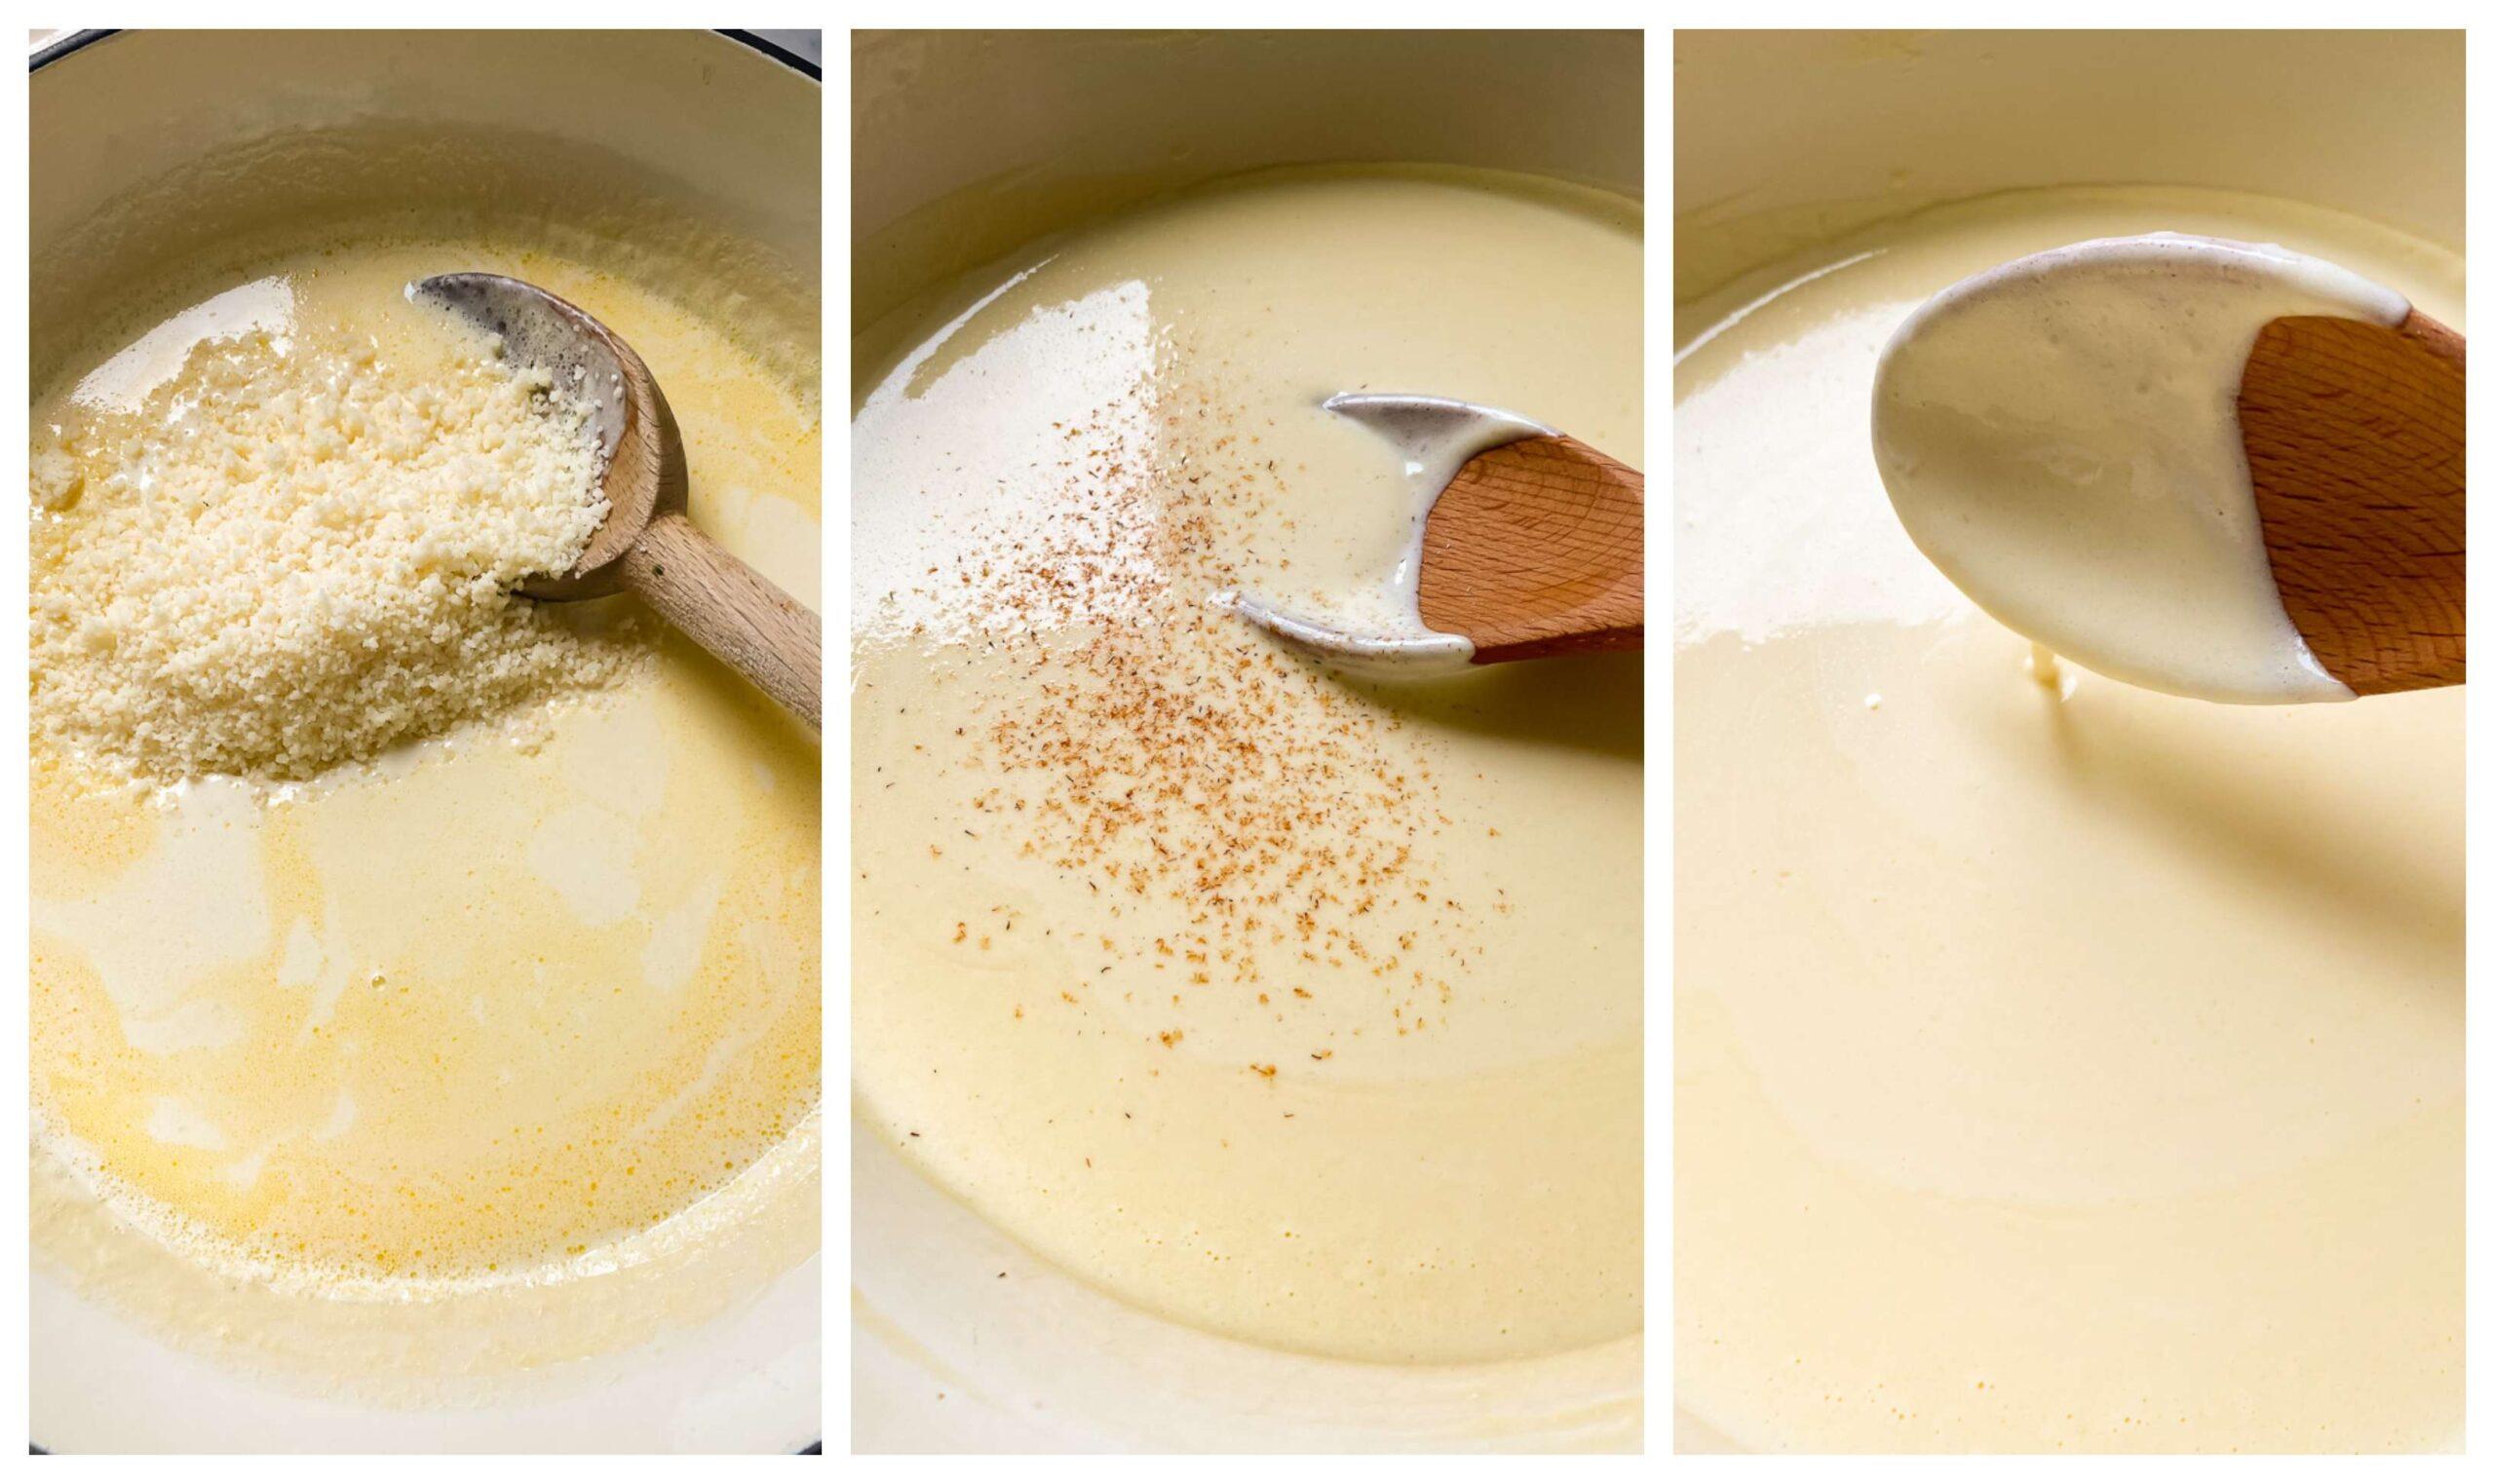 Alfredo sauce process images